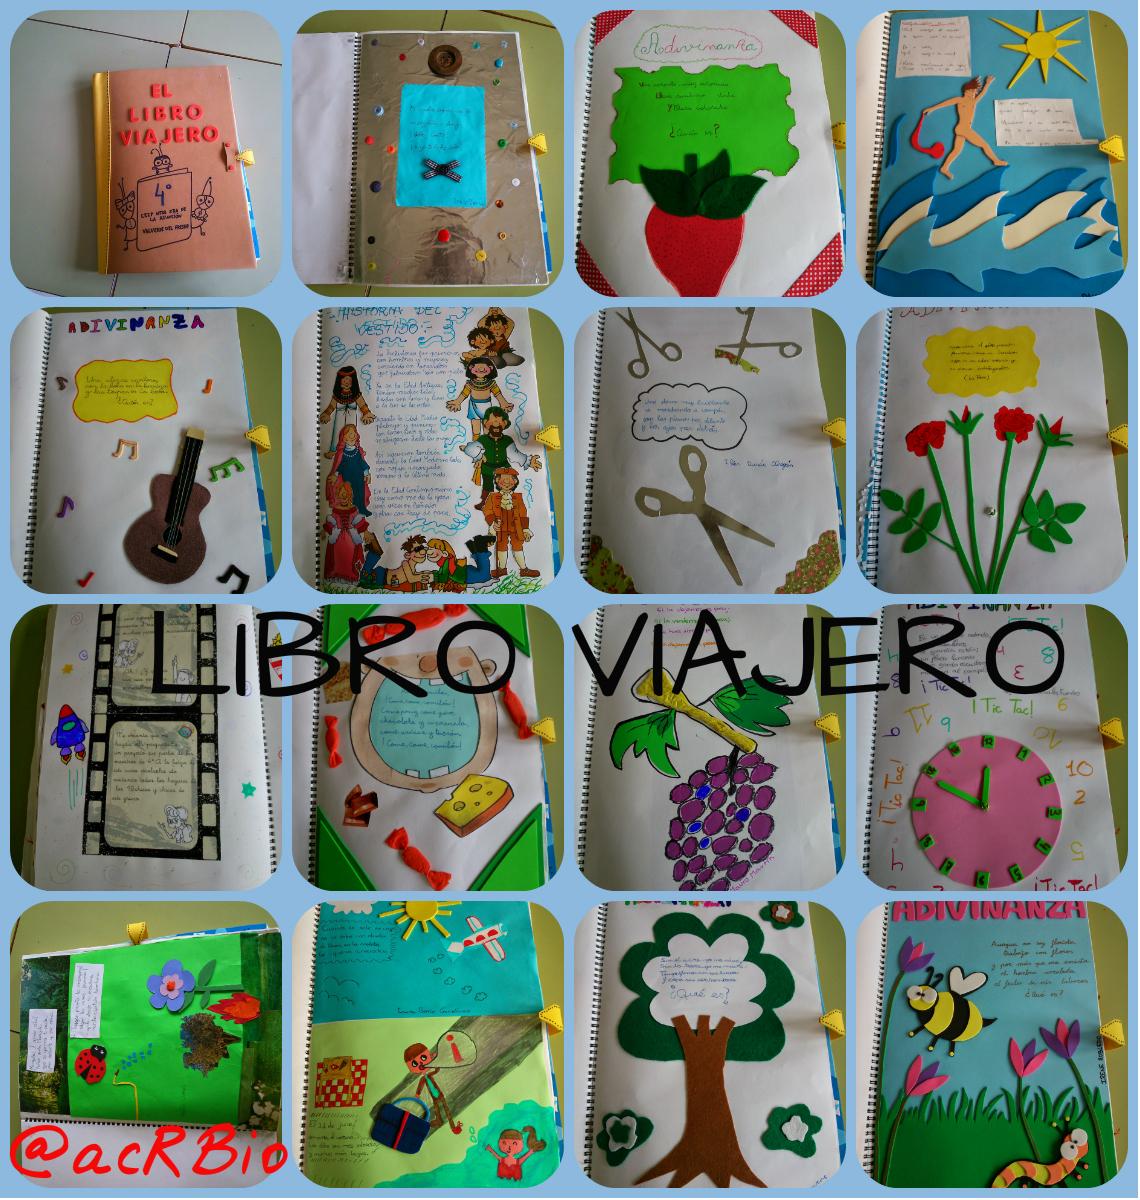 Libro Viajero Collage - Imagenes Educativas